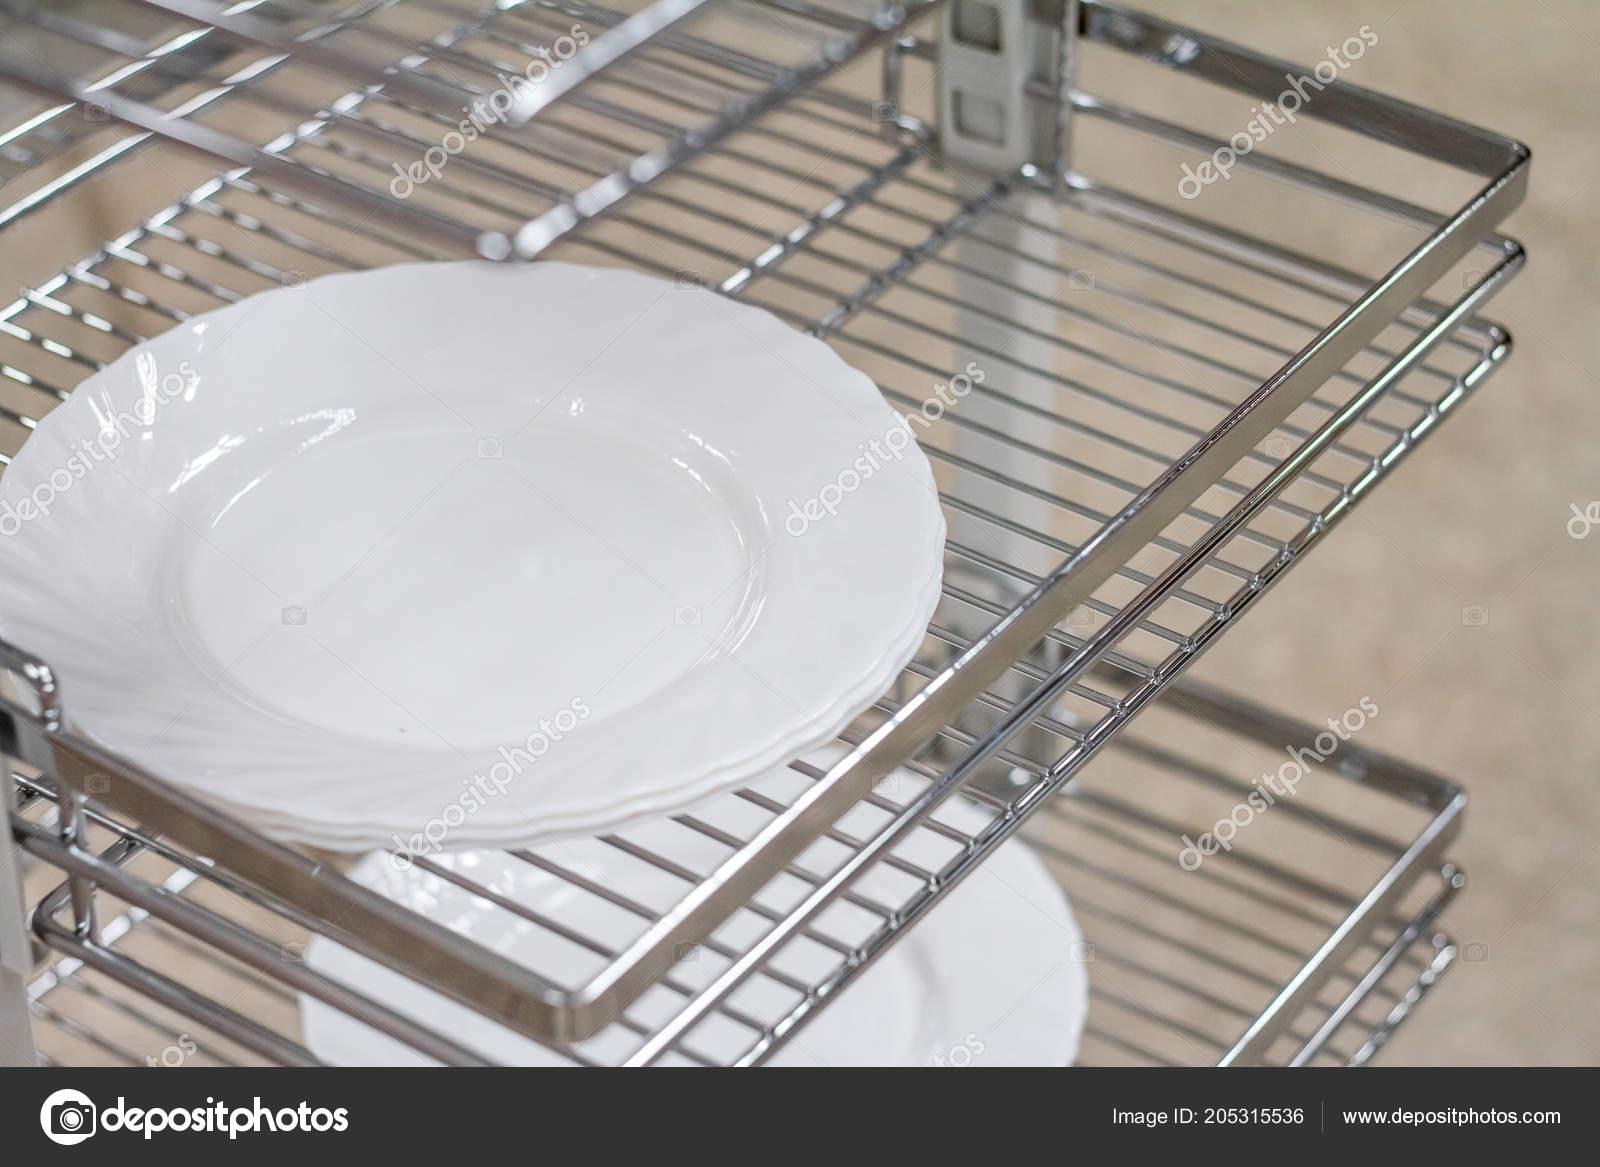 kitchen organizer clean the games 厨房用具的组织者 家具配件 内置设备 图库照片 c ramann 205315536